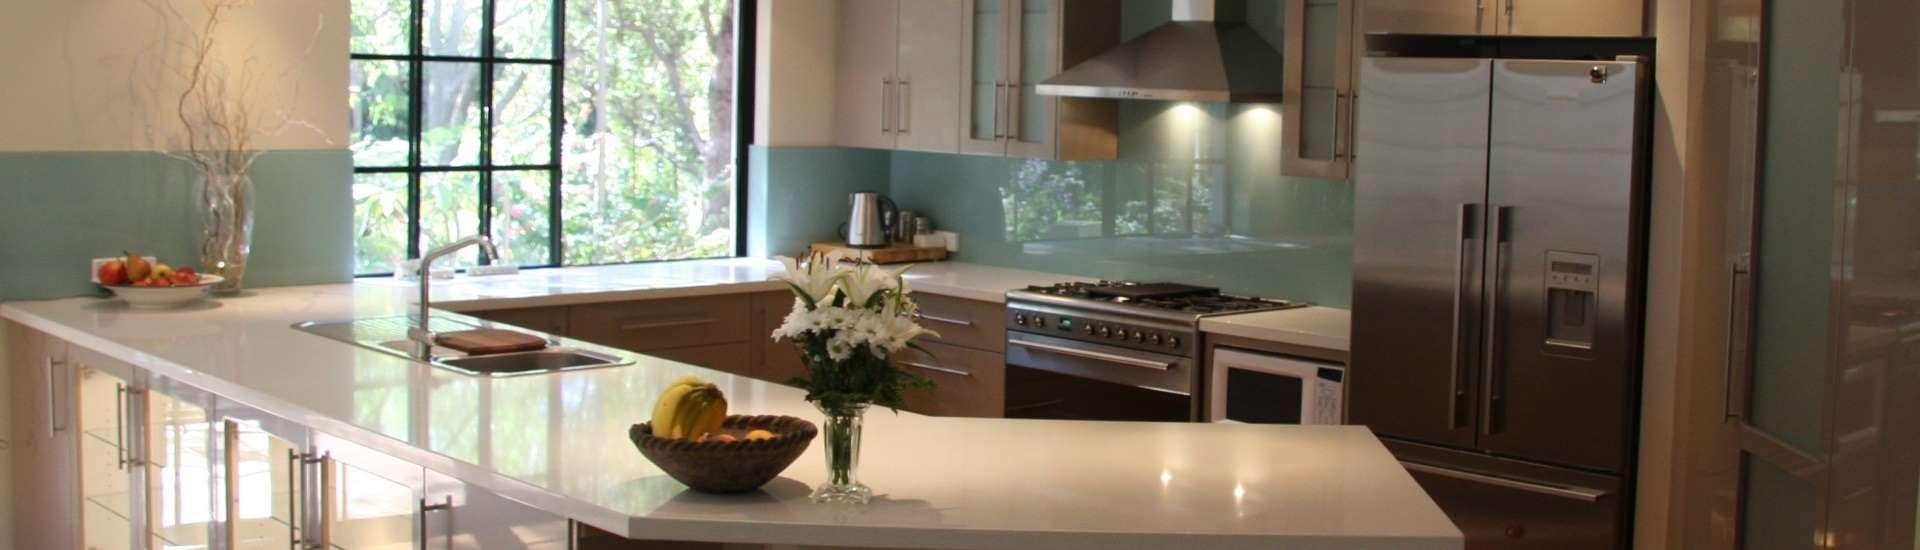 kitchen solutions - bathroom & kitchen renovations perth wa